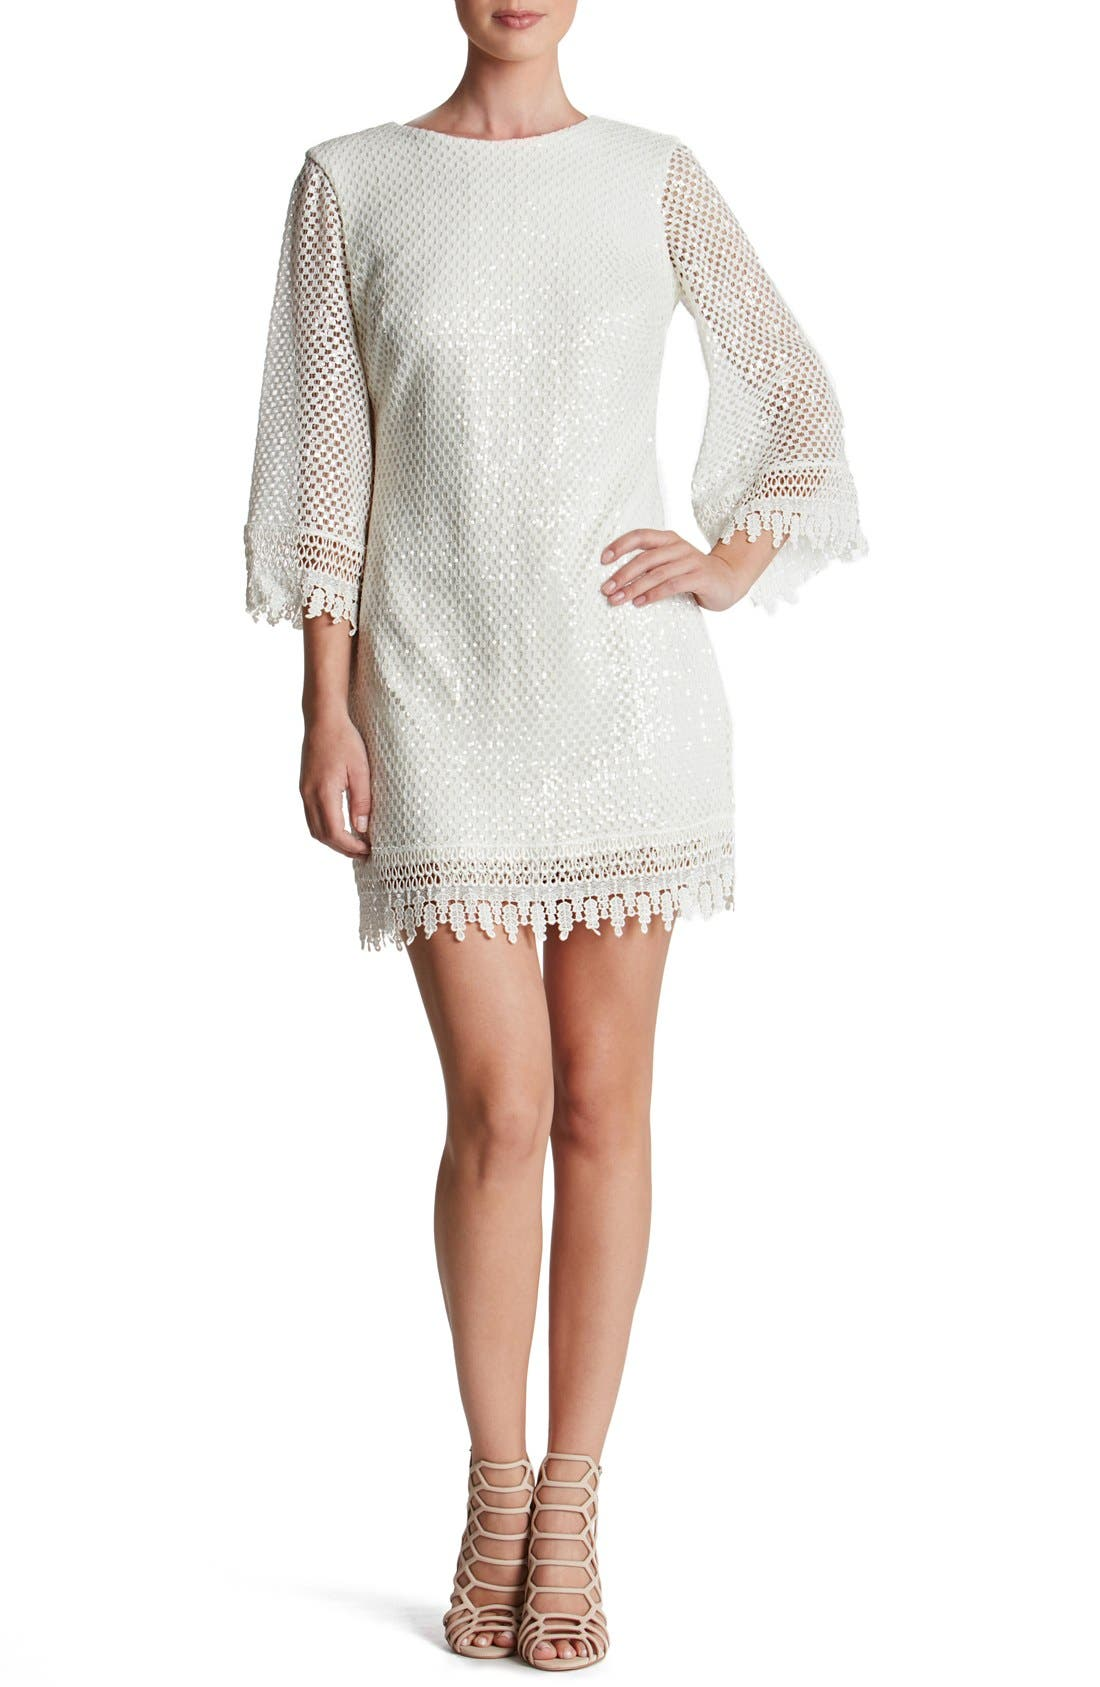 Main Image - Dress the Population 'Phoebe' Sequin Crochet Shift Dress